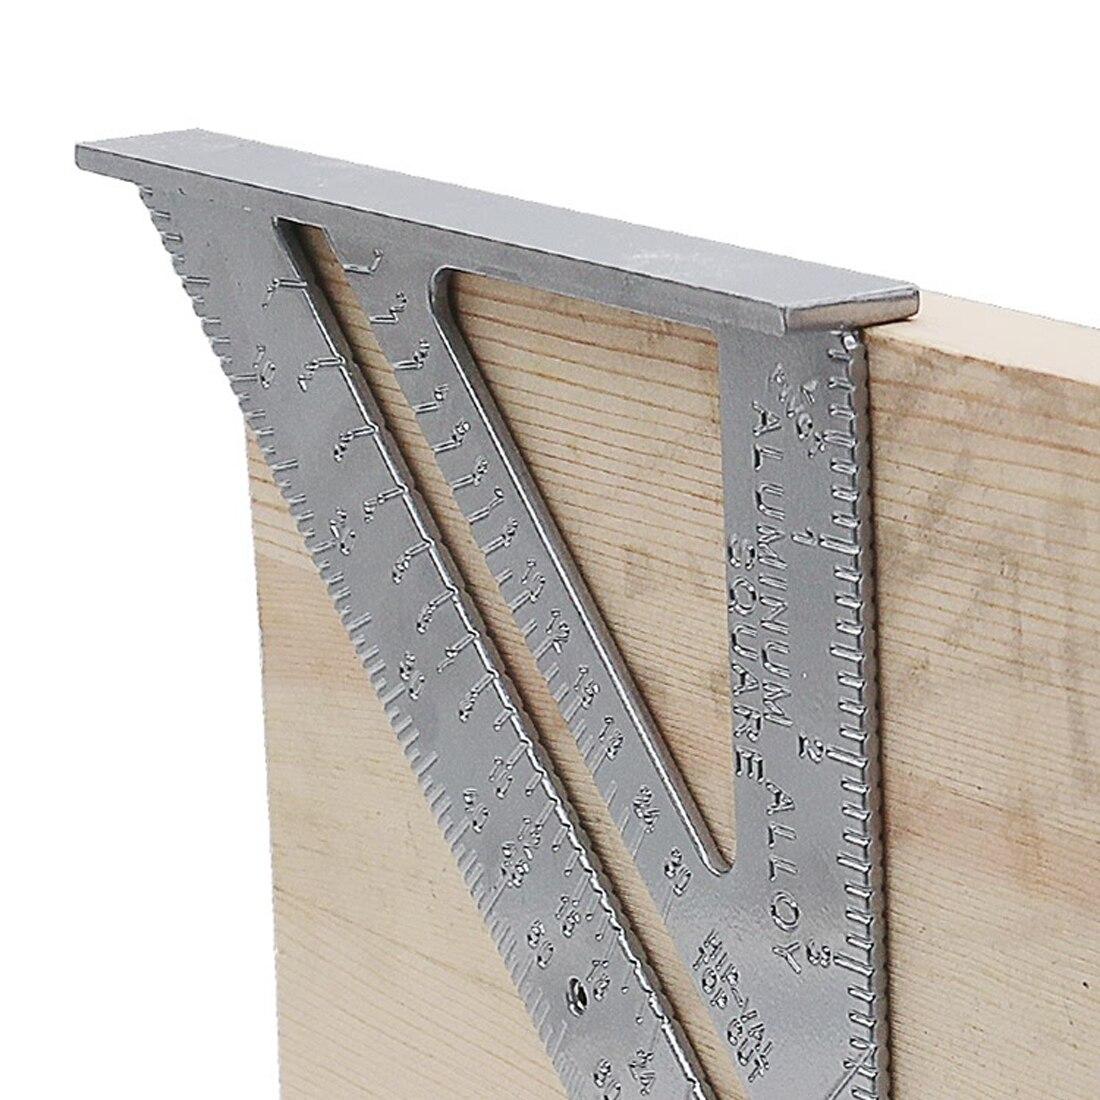 Measurement Inch Carpenter Ruler Speed Square Protractor Aluminum Alloy Miter Framing Tri-square Line Scriber Saw Guide цена